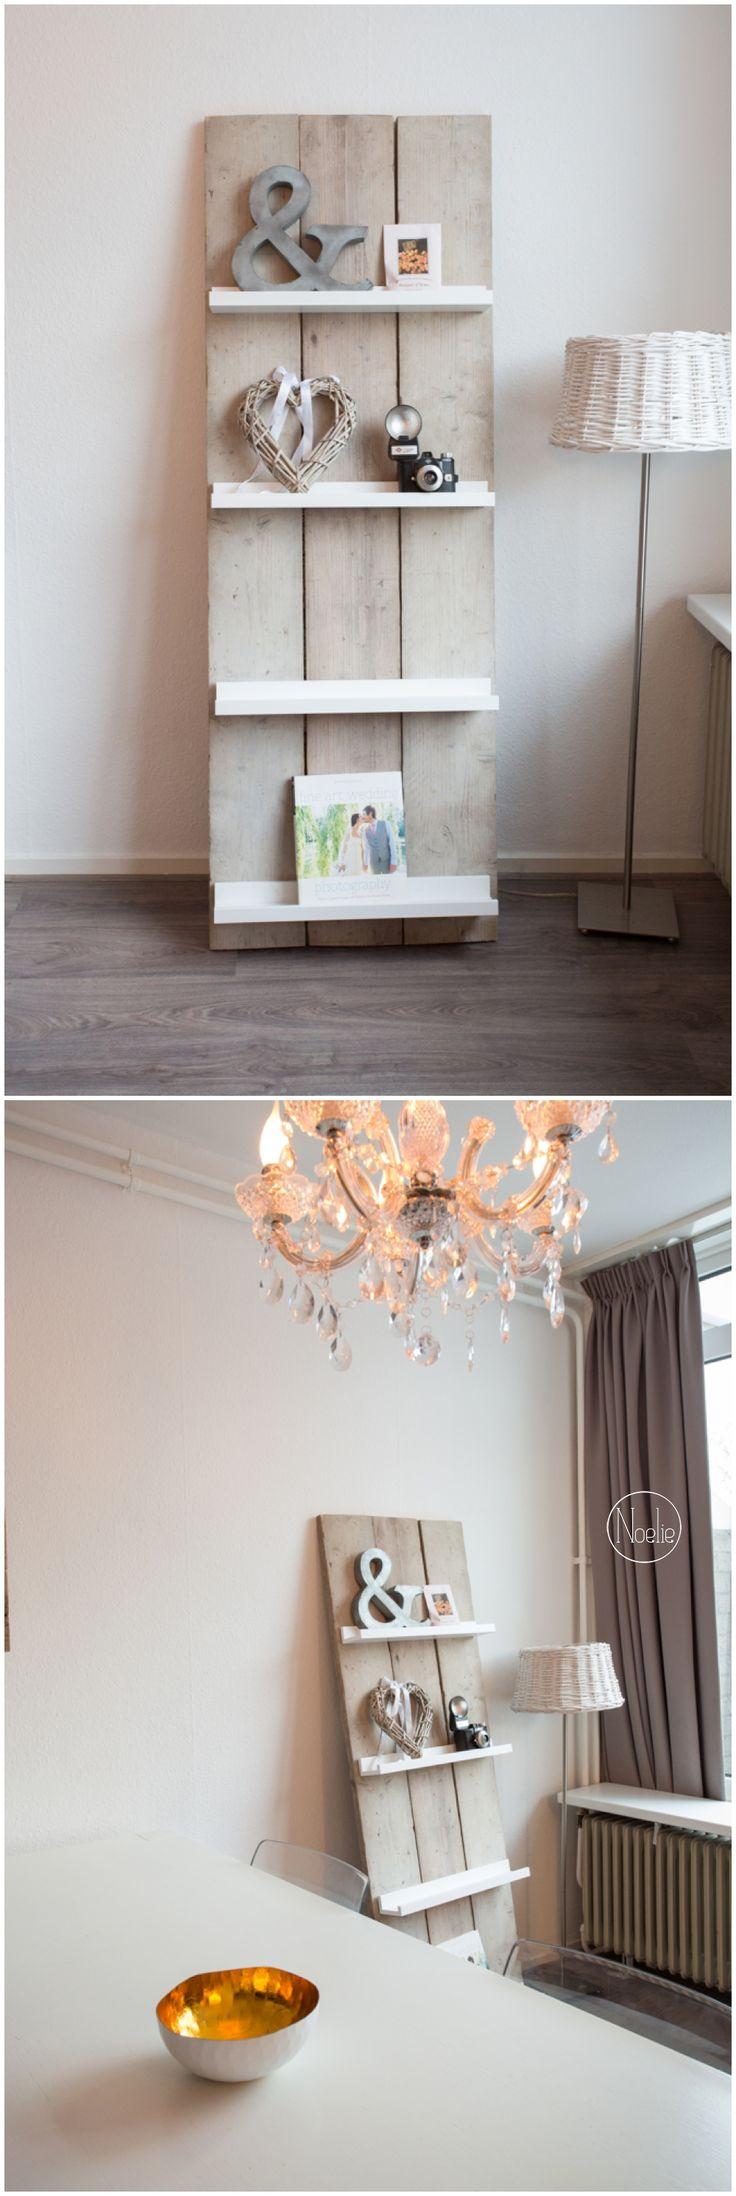 Ikea Hochstuhl Gebraucht Ch ~ Tijdschriftenrek van steigerhout Zelf gemaakt van steigerhout en